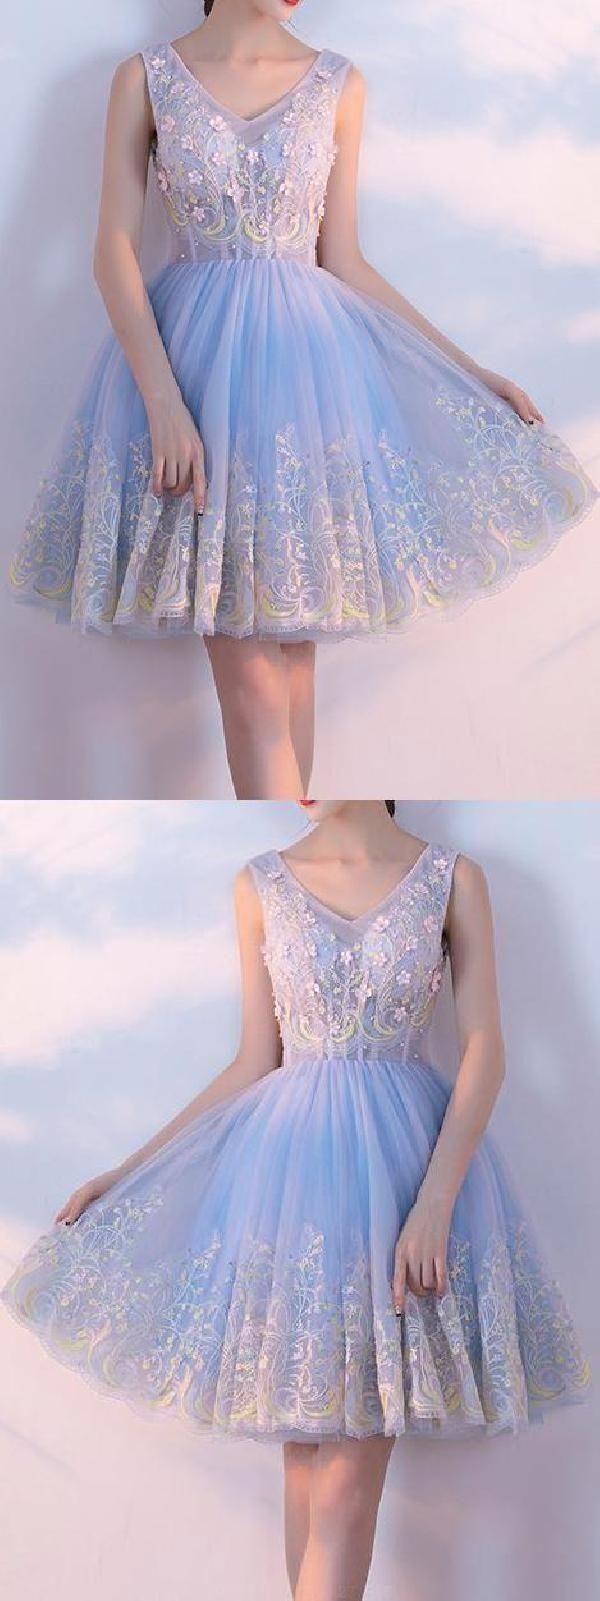 Customized short prom homecoming dress luscious light blue